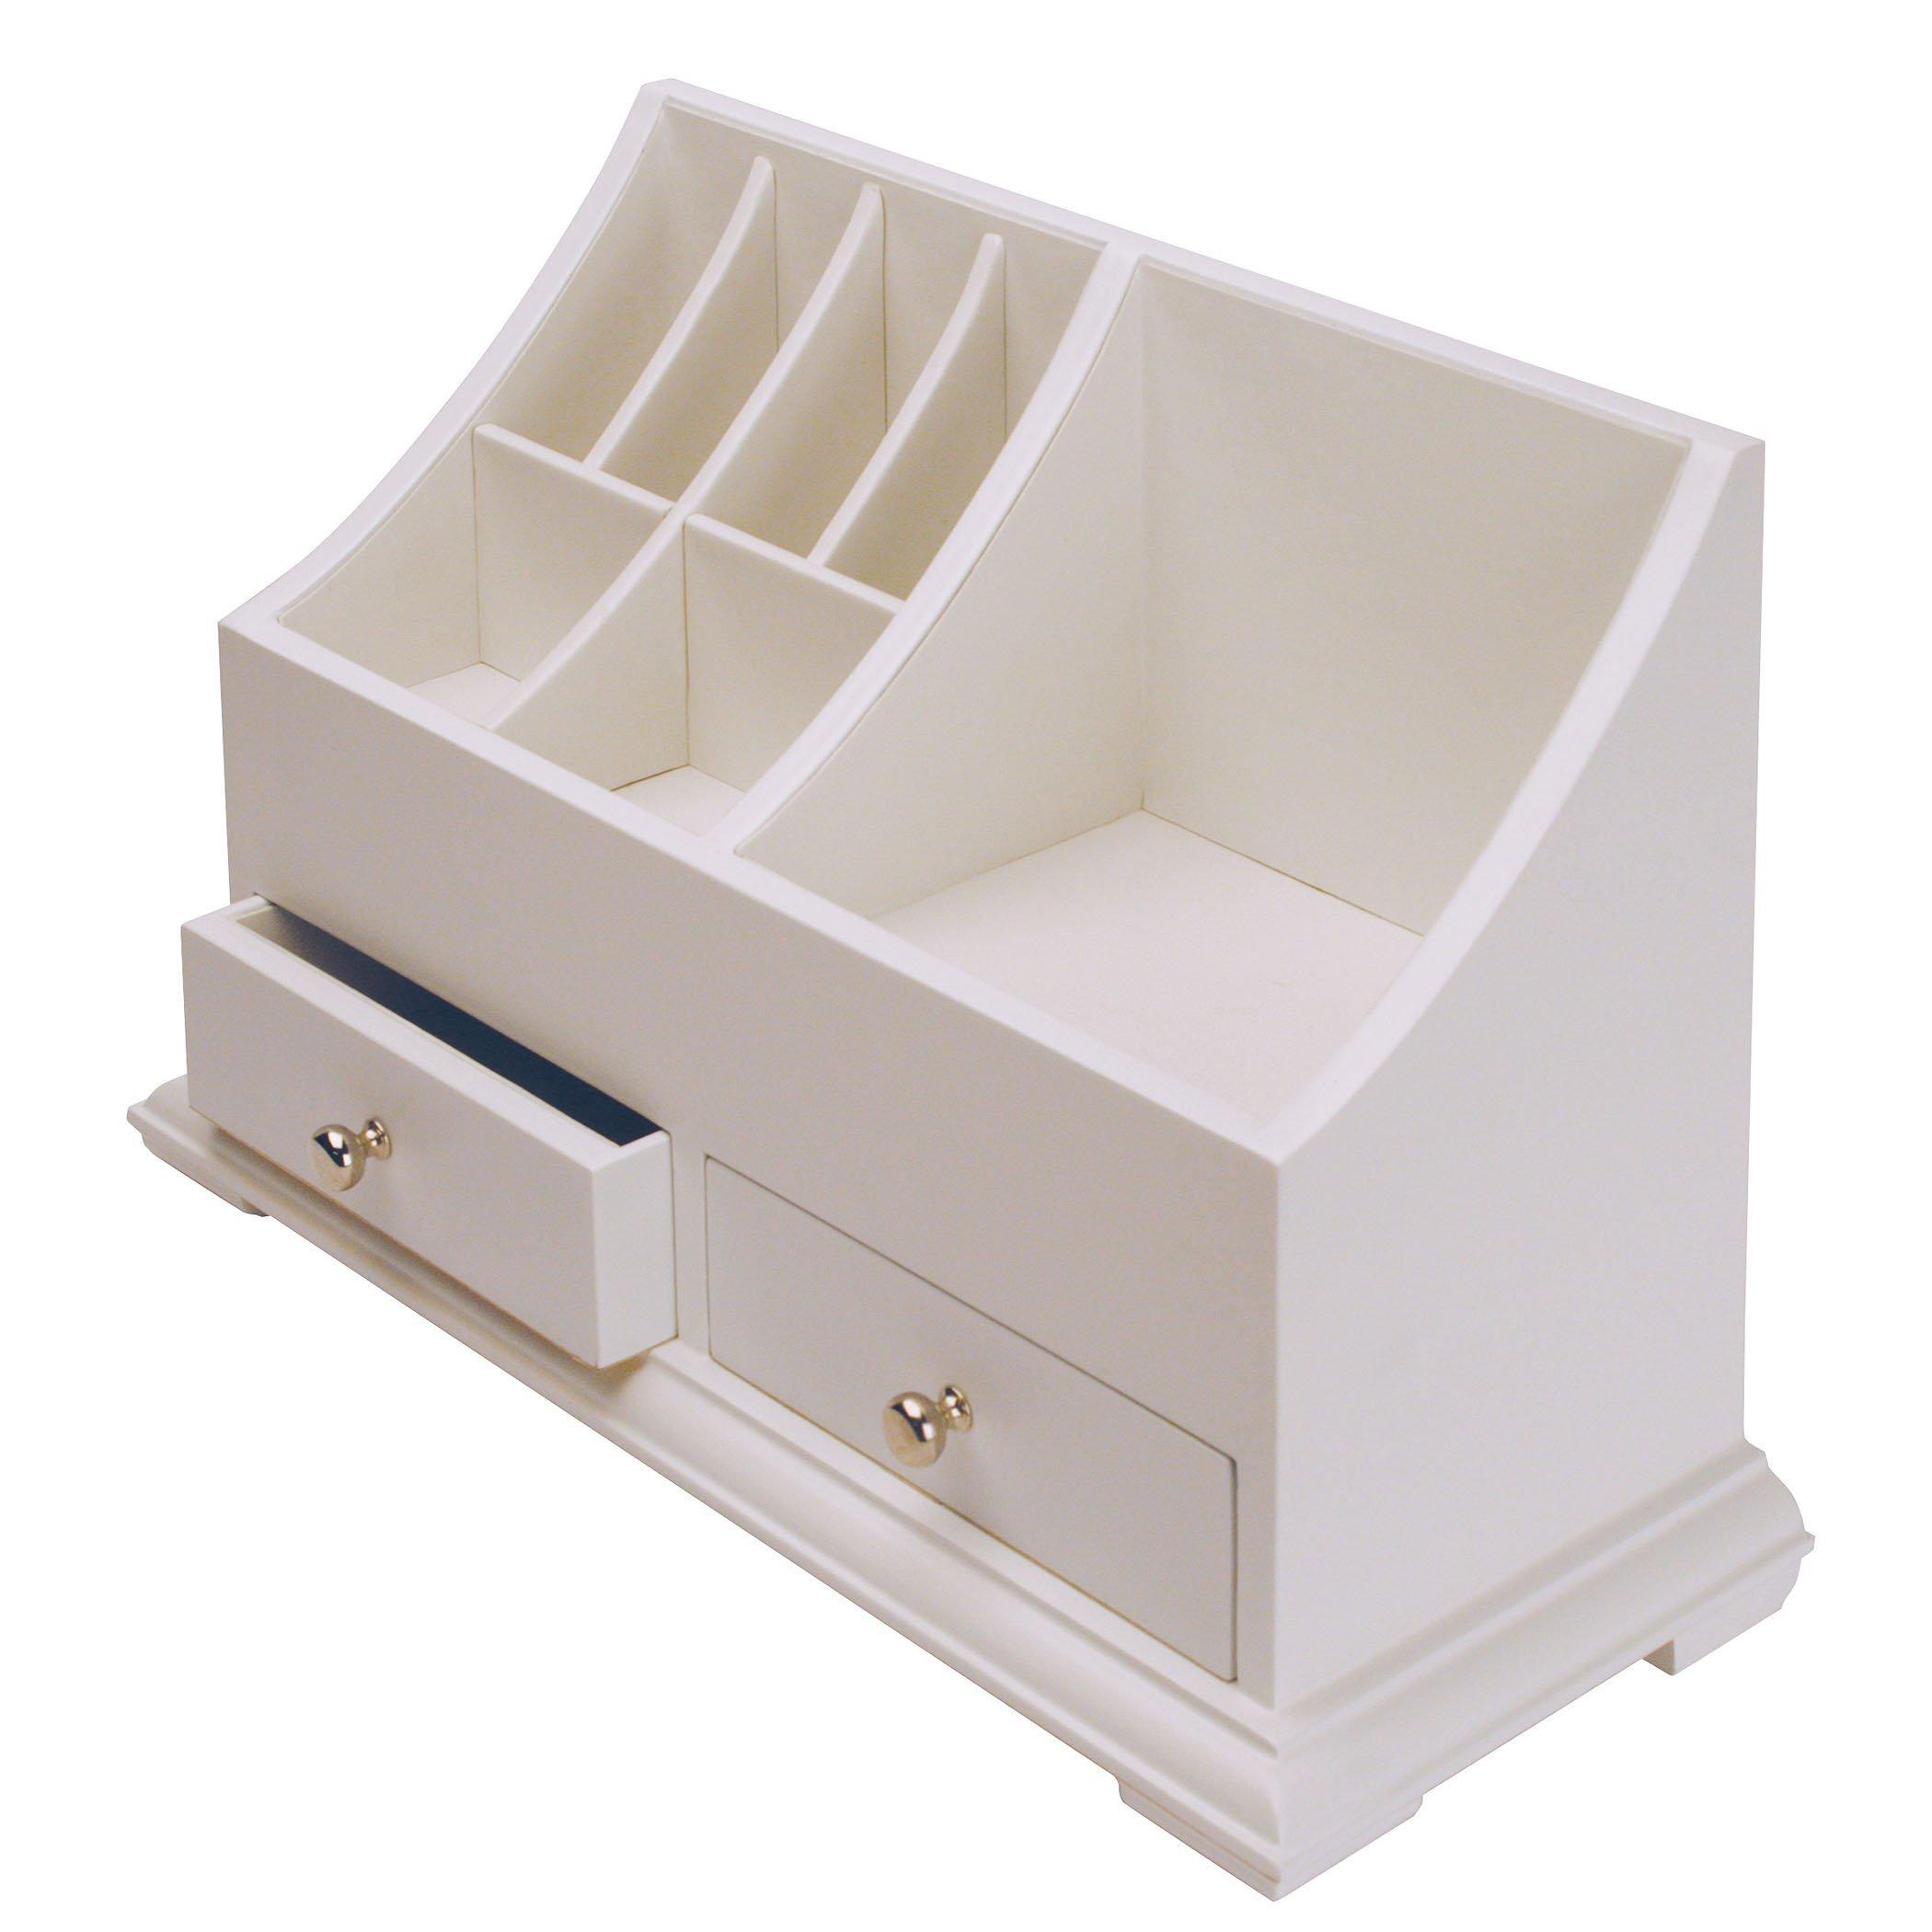 Richards Homewares Personal Organizer - White - 14'' x 6'' x 9''